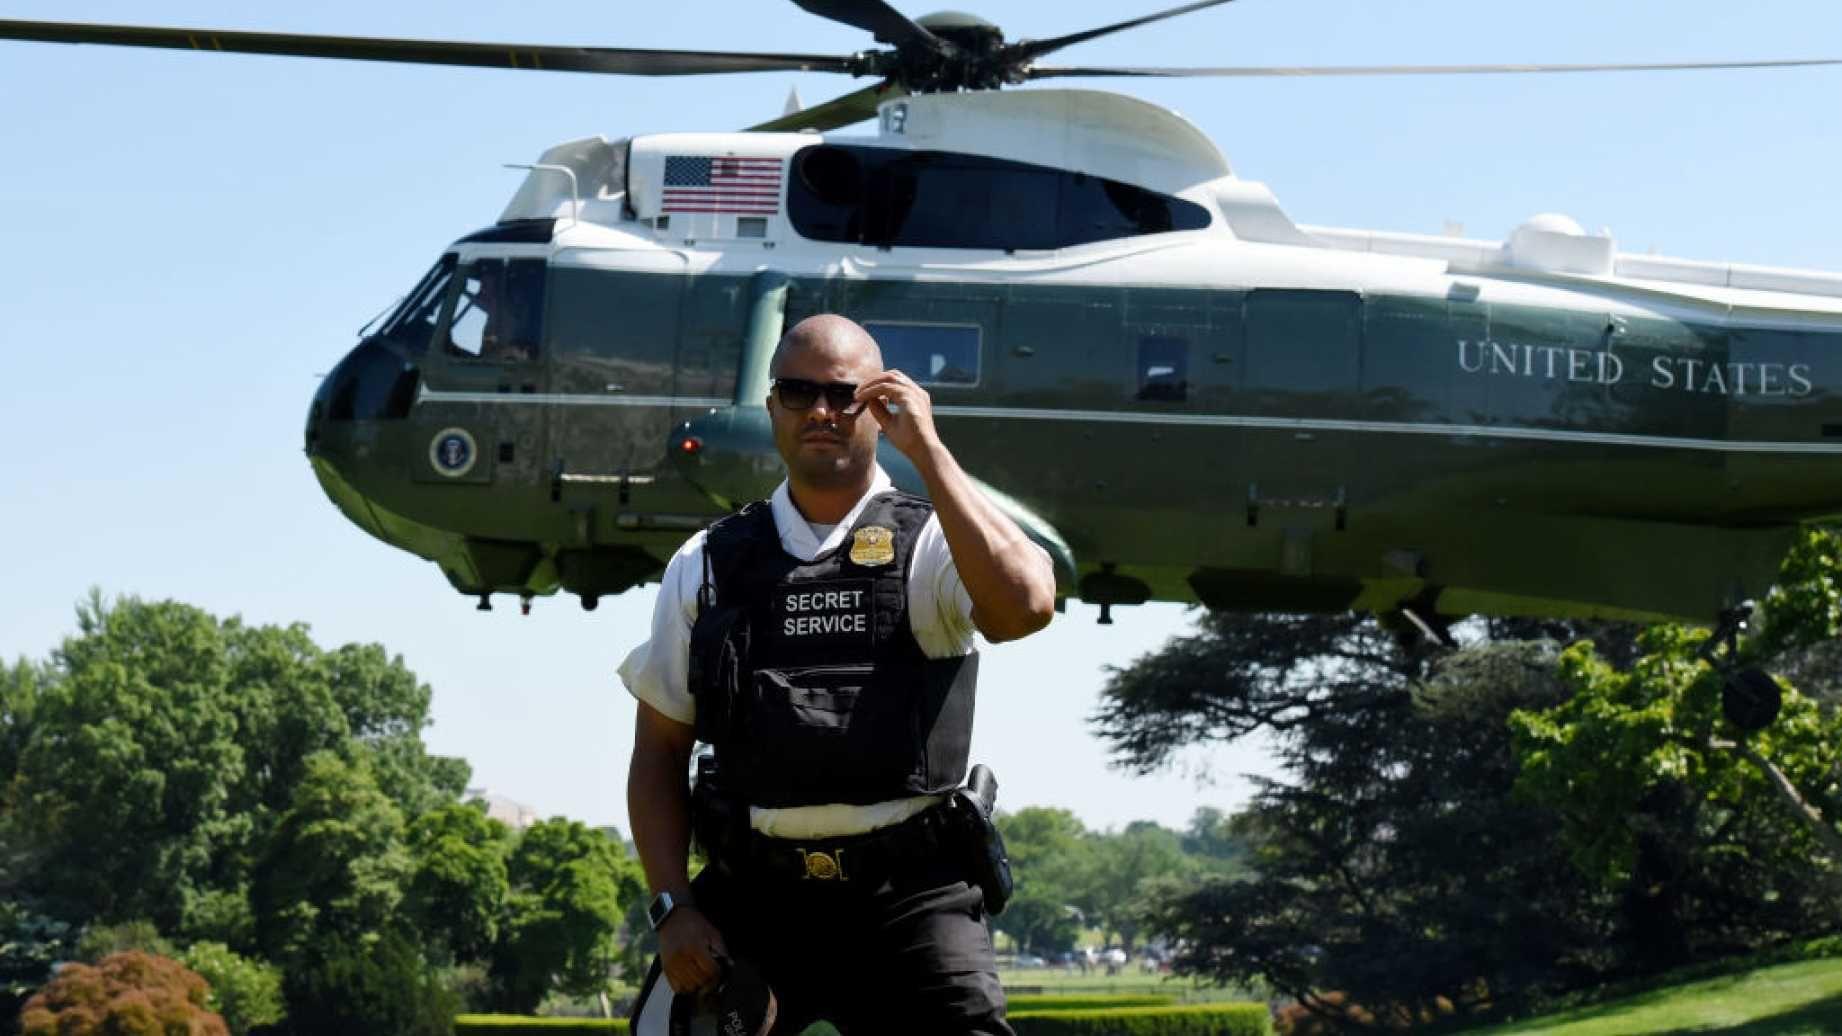 FAKE NEWS! Trump travel did NOT bankrupt Secret Service